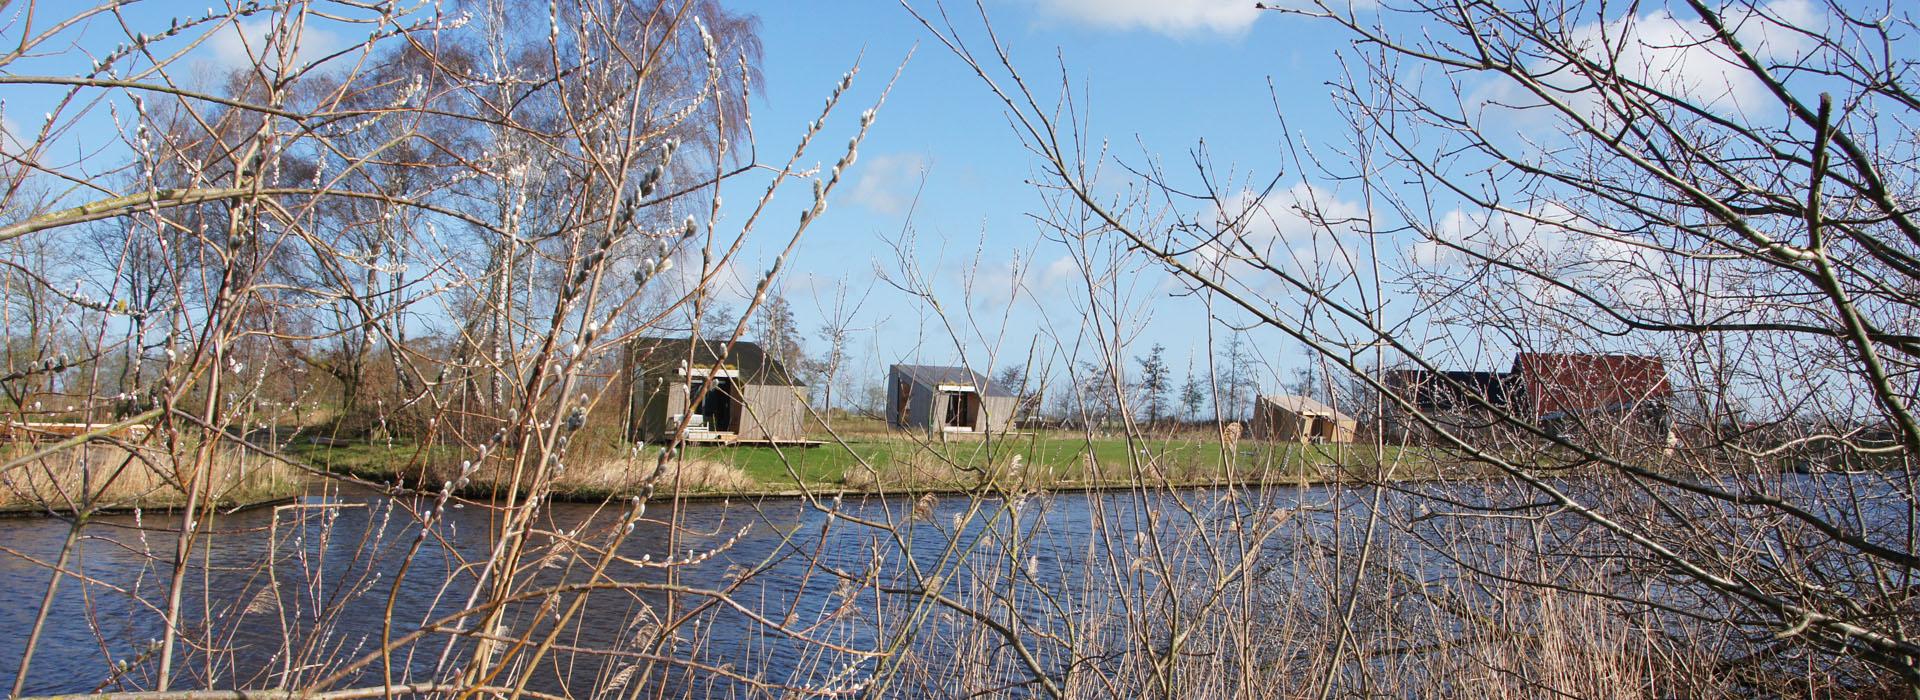 vakantie - friesland - vakantiepark - Ljeppershiem - tiny house-natuurhuisje